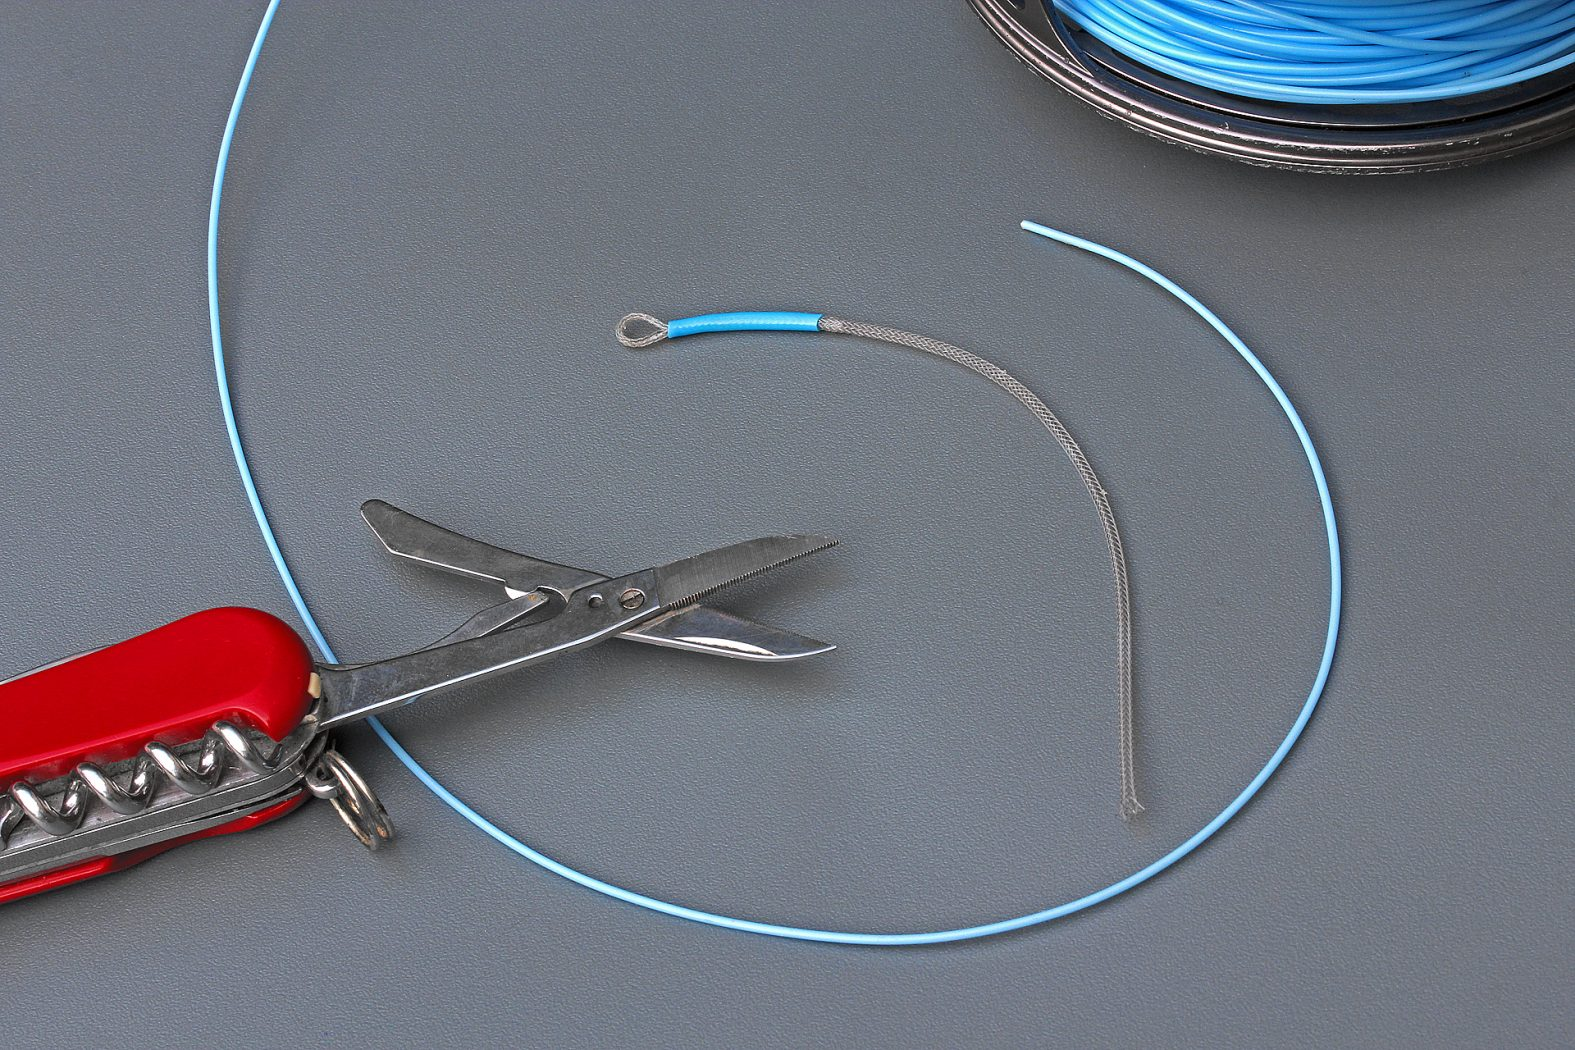 Loop on Junction an Fliegenschnur anbringen